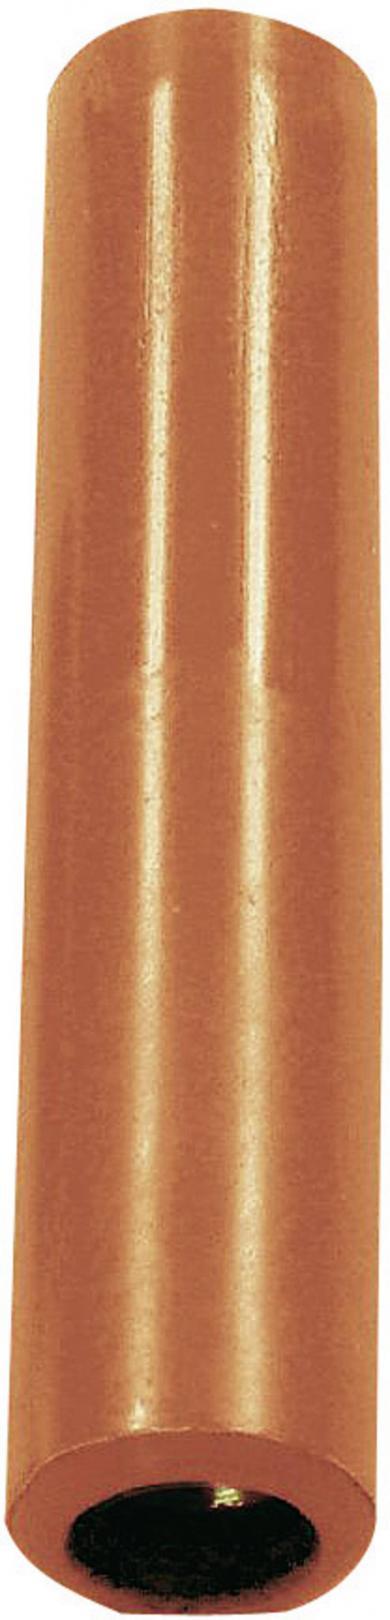 Mufă banană mamă Hirschmann KK4/4, 32 A, 4 mm, roşu